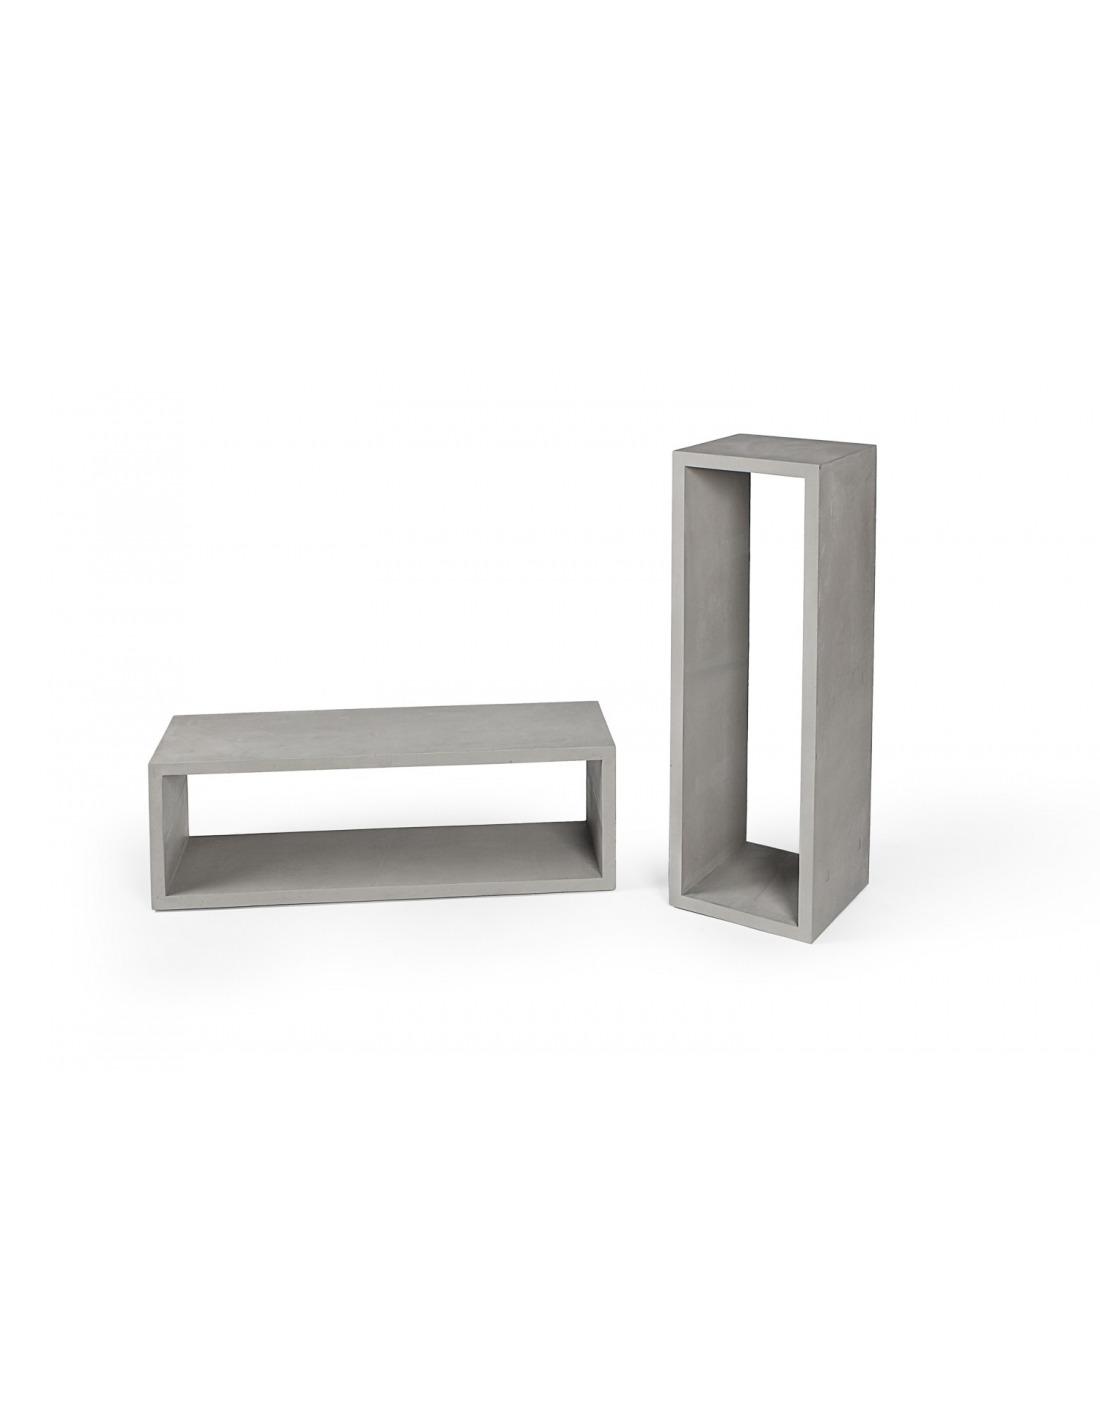 Cube de rangement monobloc en b ton l otoko - Cube design rangement ...